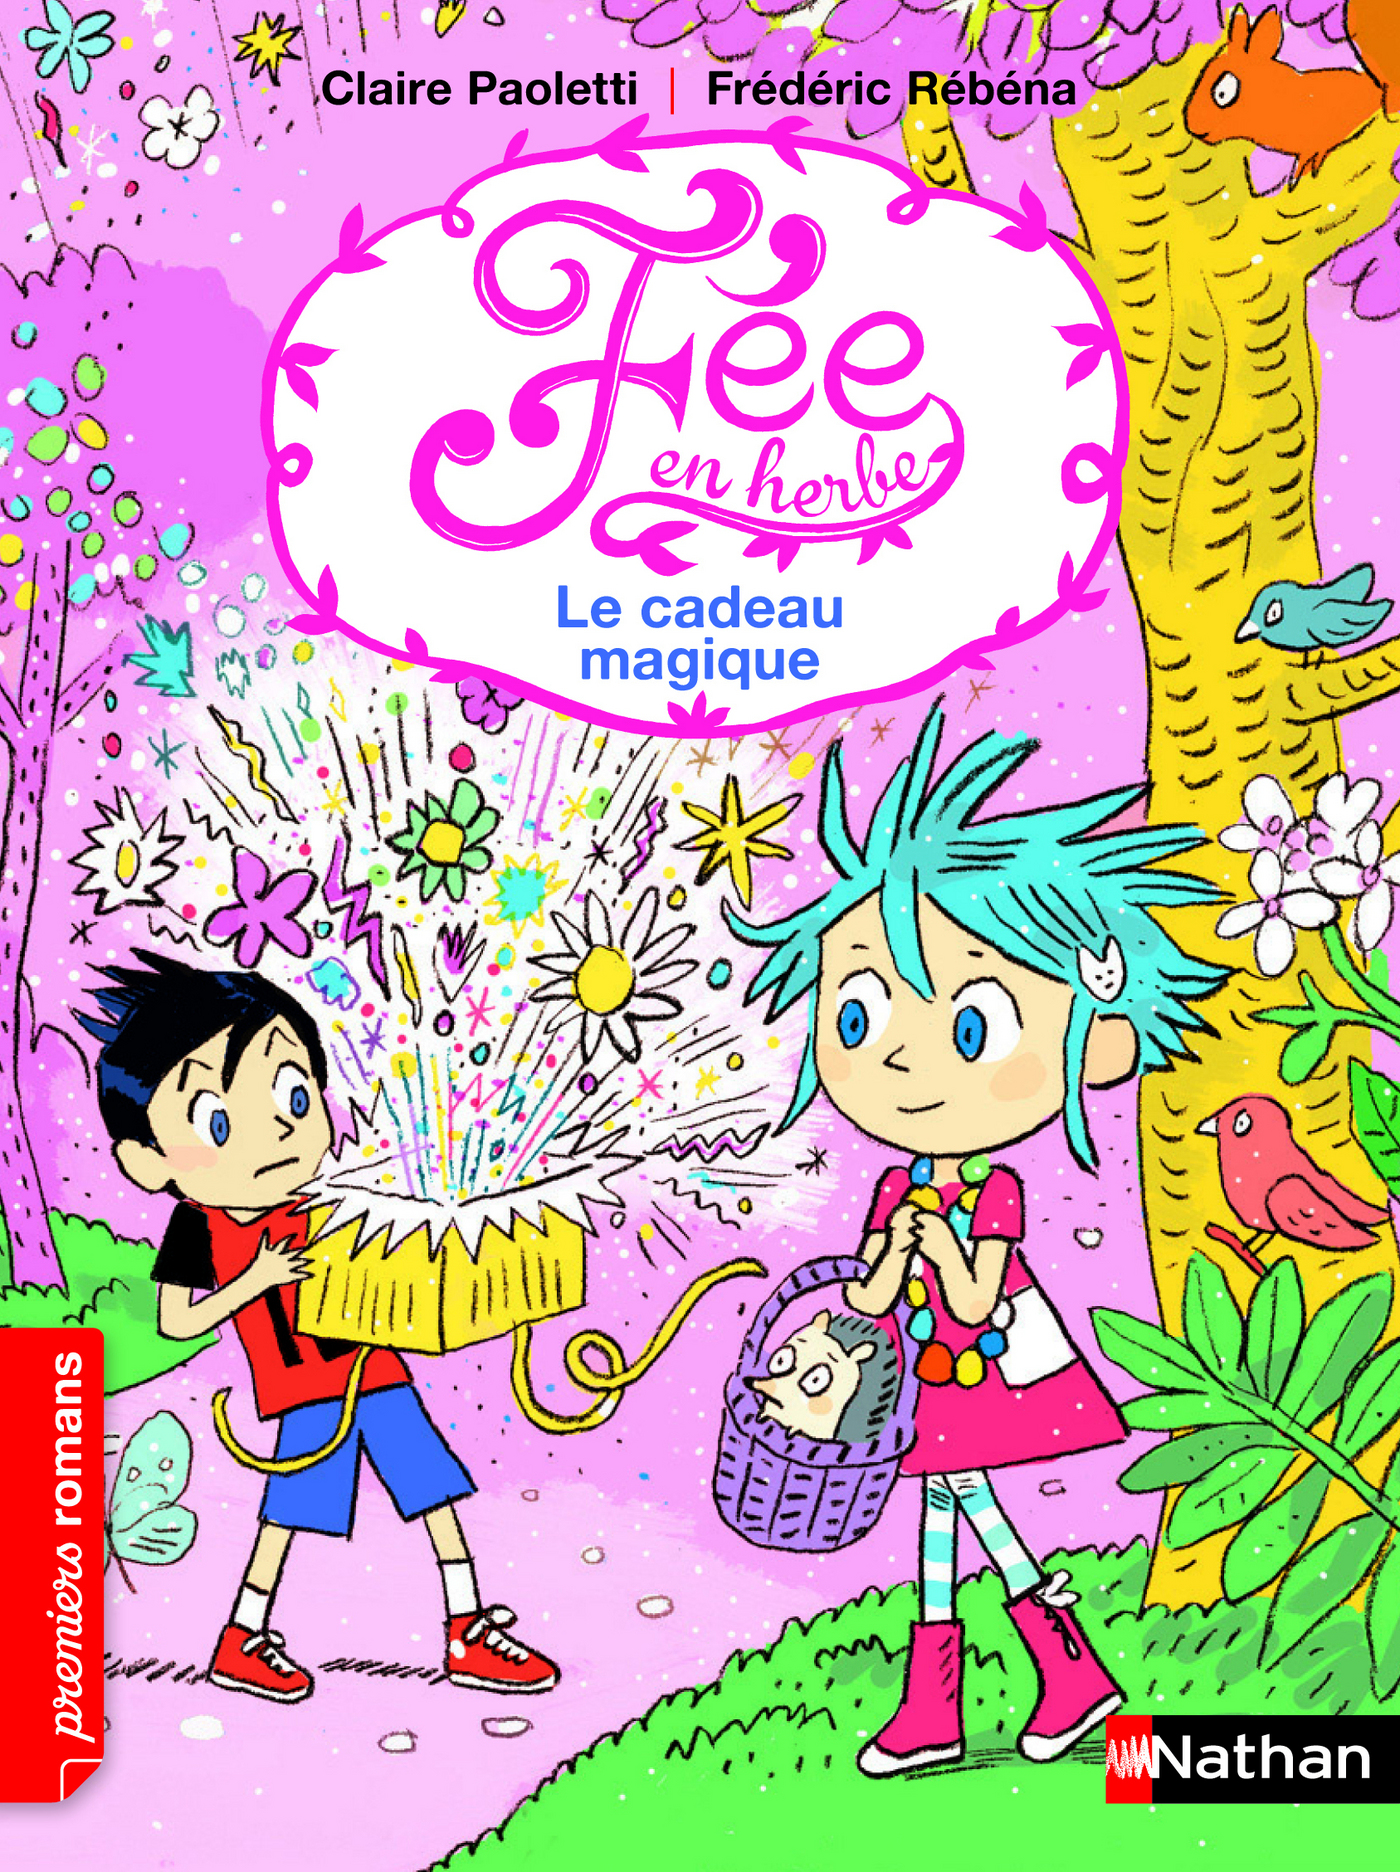 Le cadeau magique (ebook)